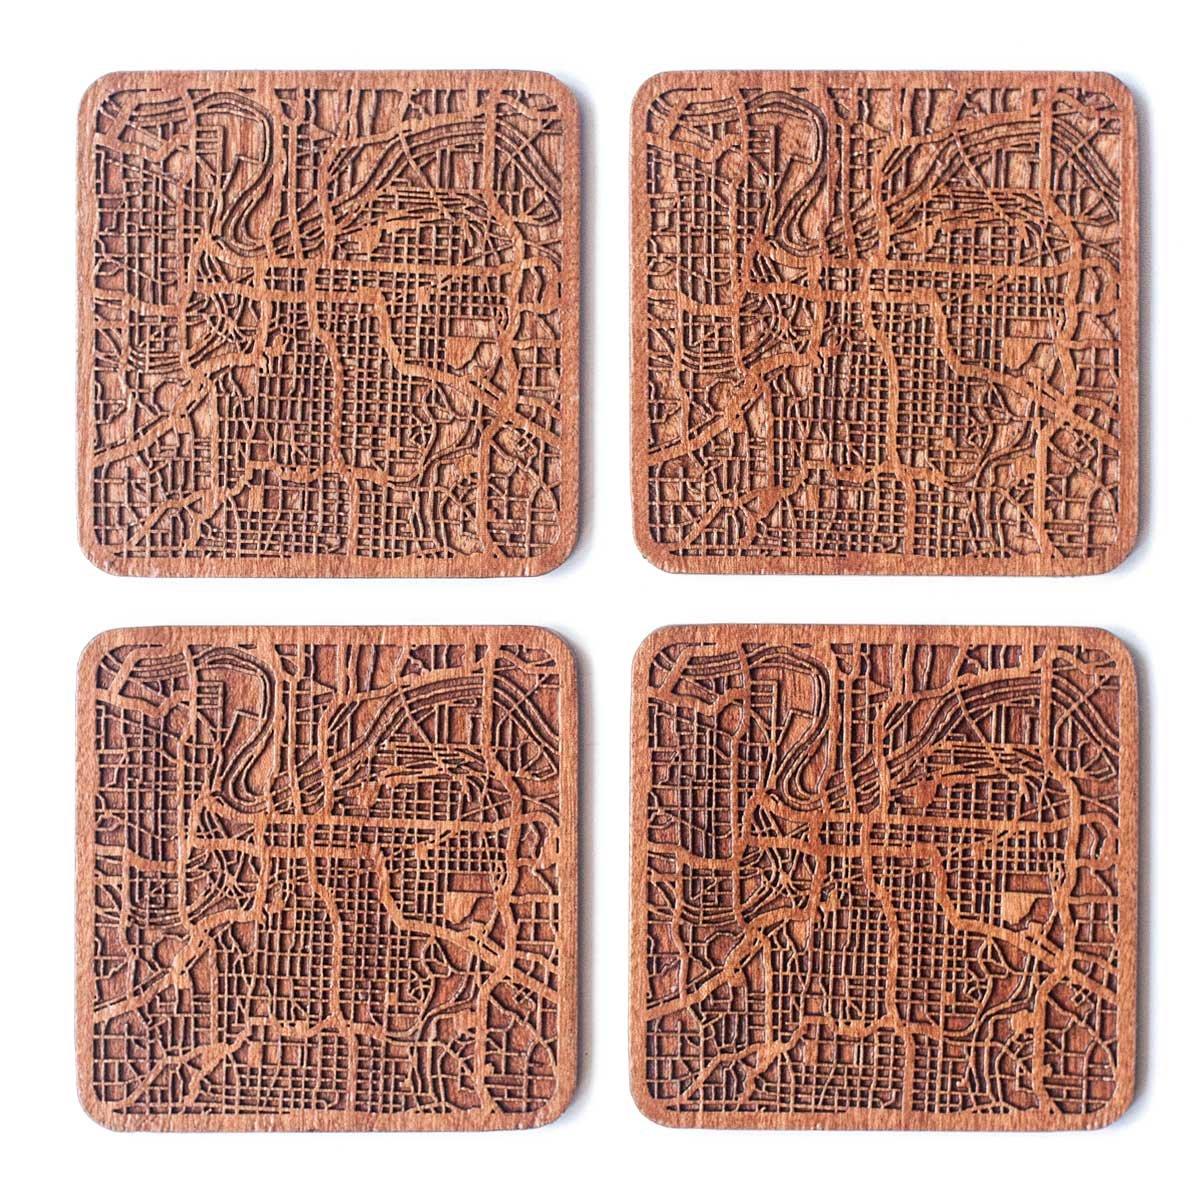 Kansas City Map Coaster, Set of 4, Sapele Wooden